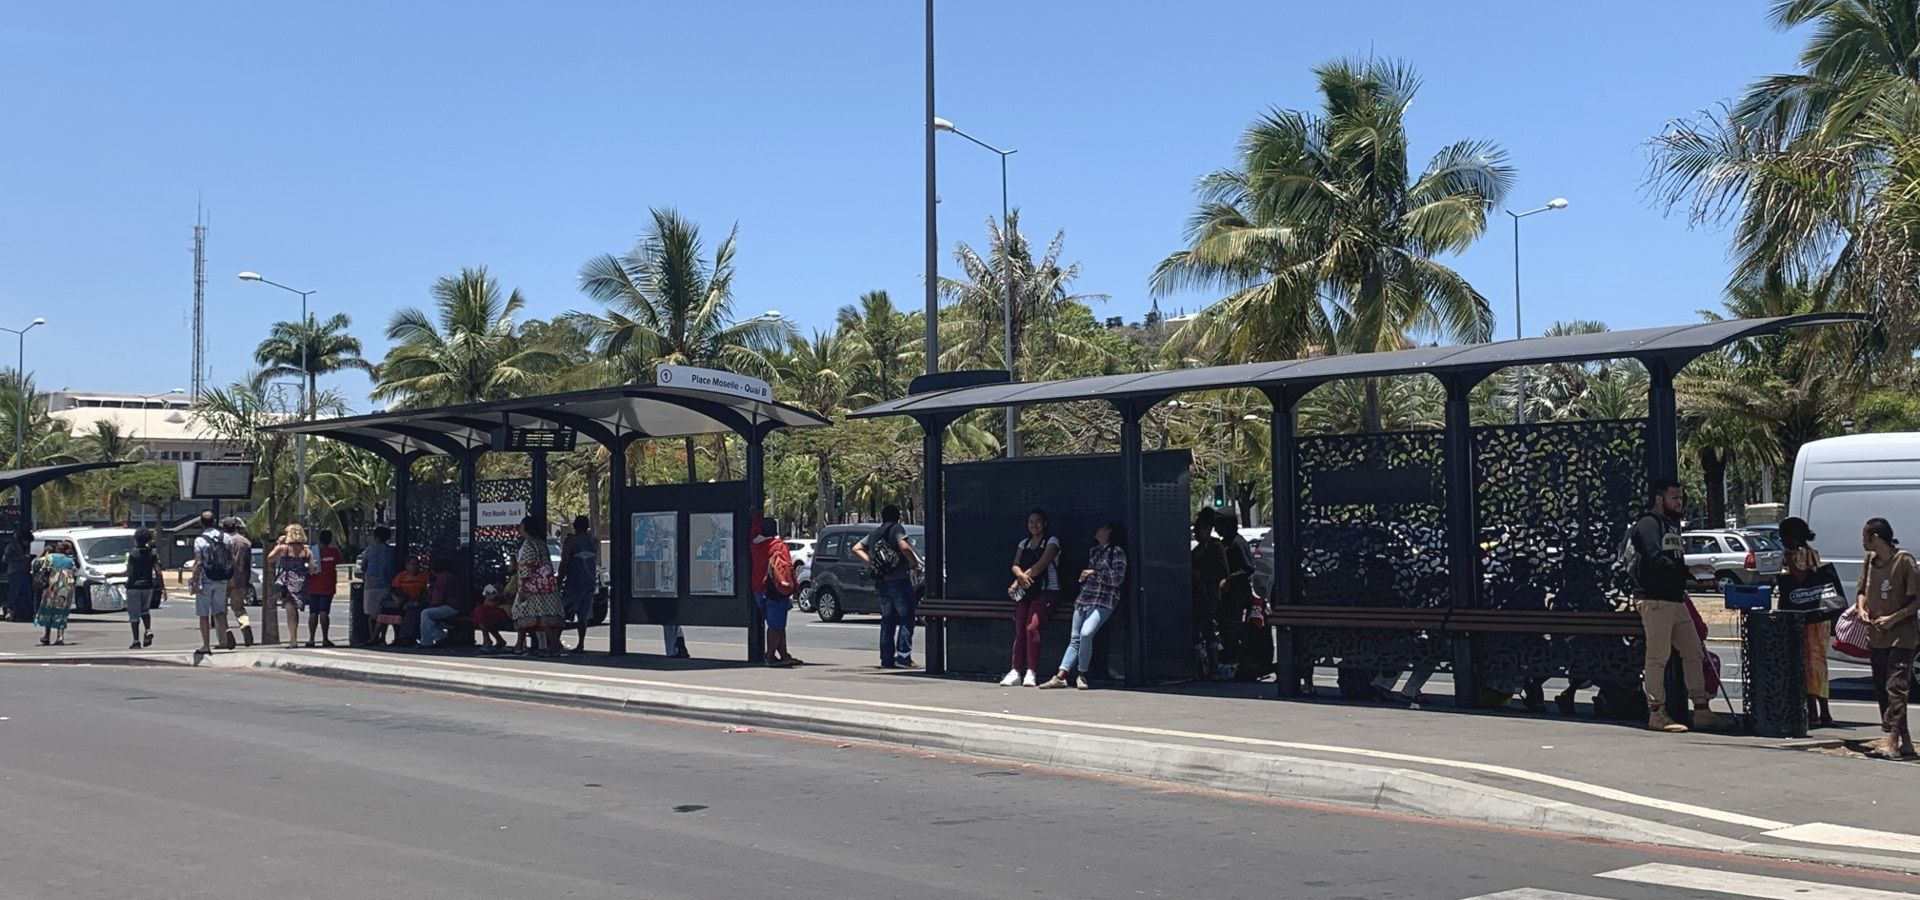 Abri Bus Design BHNS NOUMEA - Fabricant METALCO Mobilier Urbain Collectivité